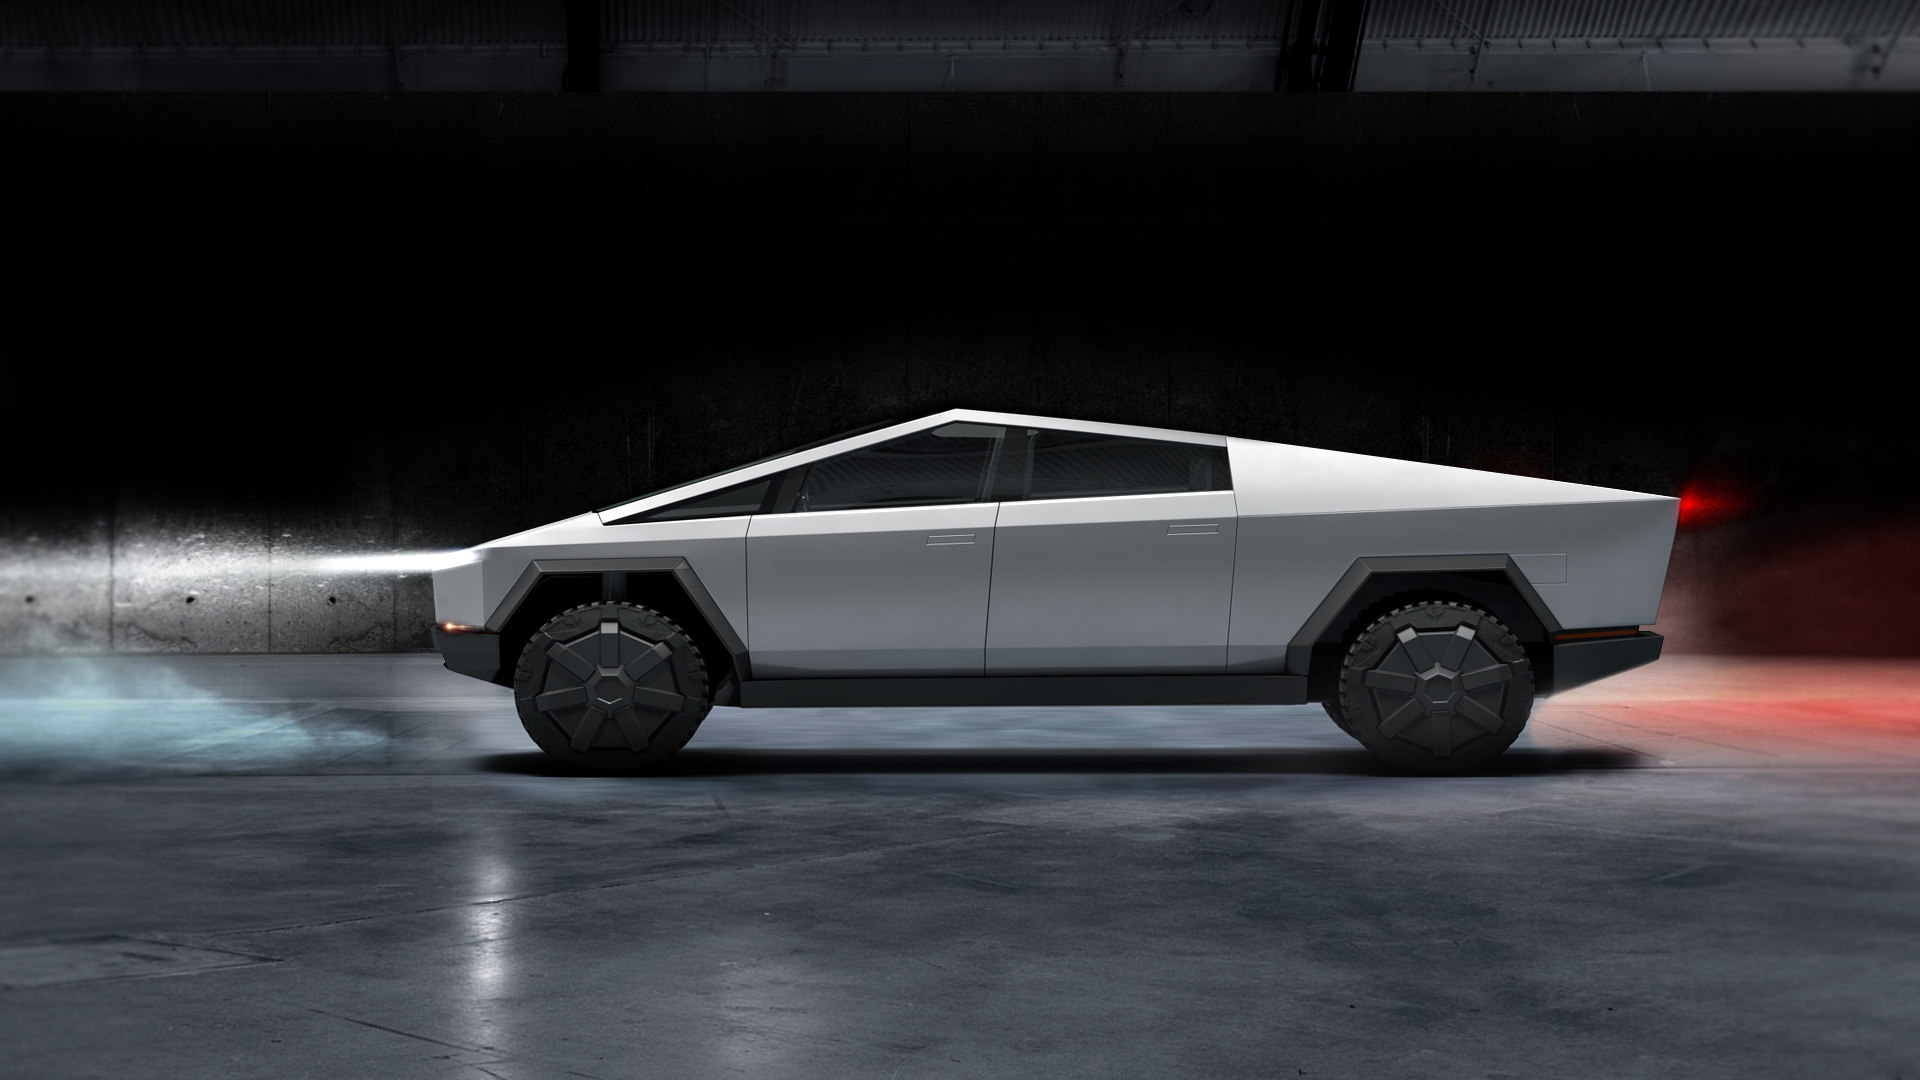 Tesla cybertruck cyberquad atv model - TurboSquid 1524581